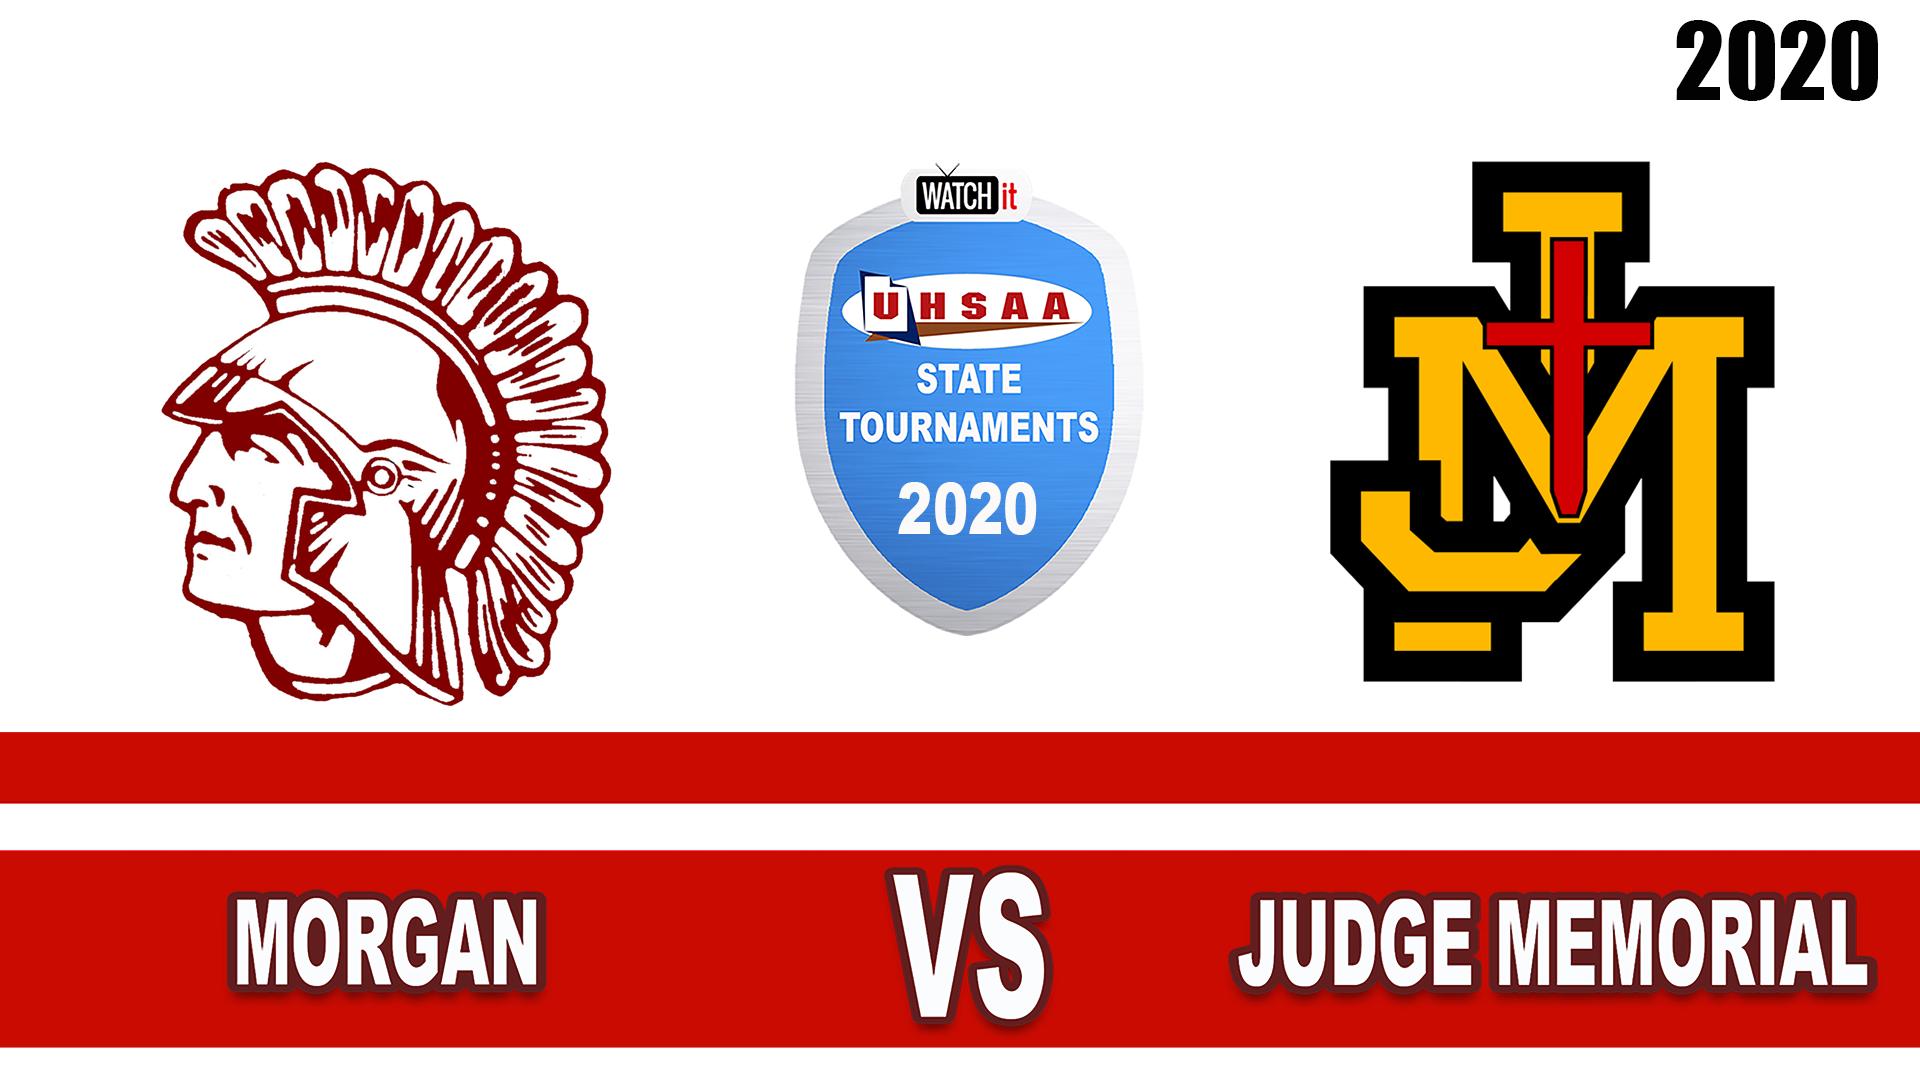 Morgan vs Judge Memorial